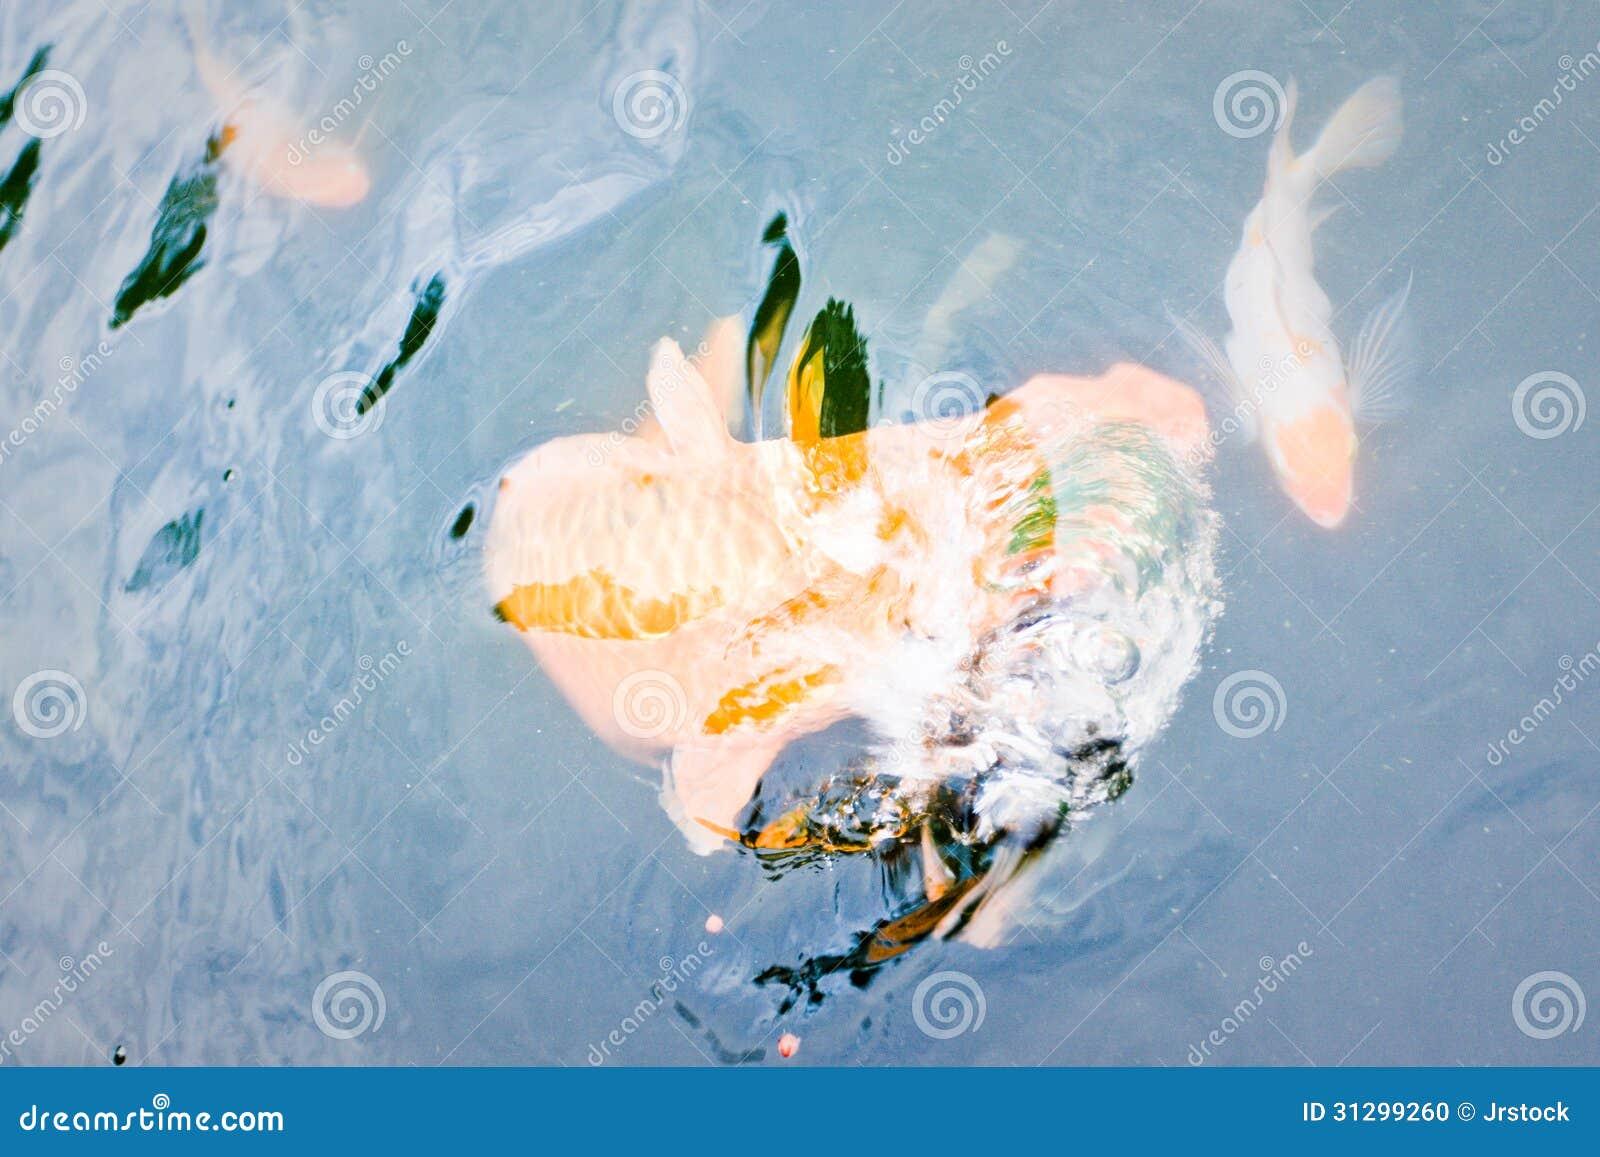 Ornamental koi fish stock photo image 31299260 for Ornamental fish garden ponds